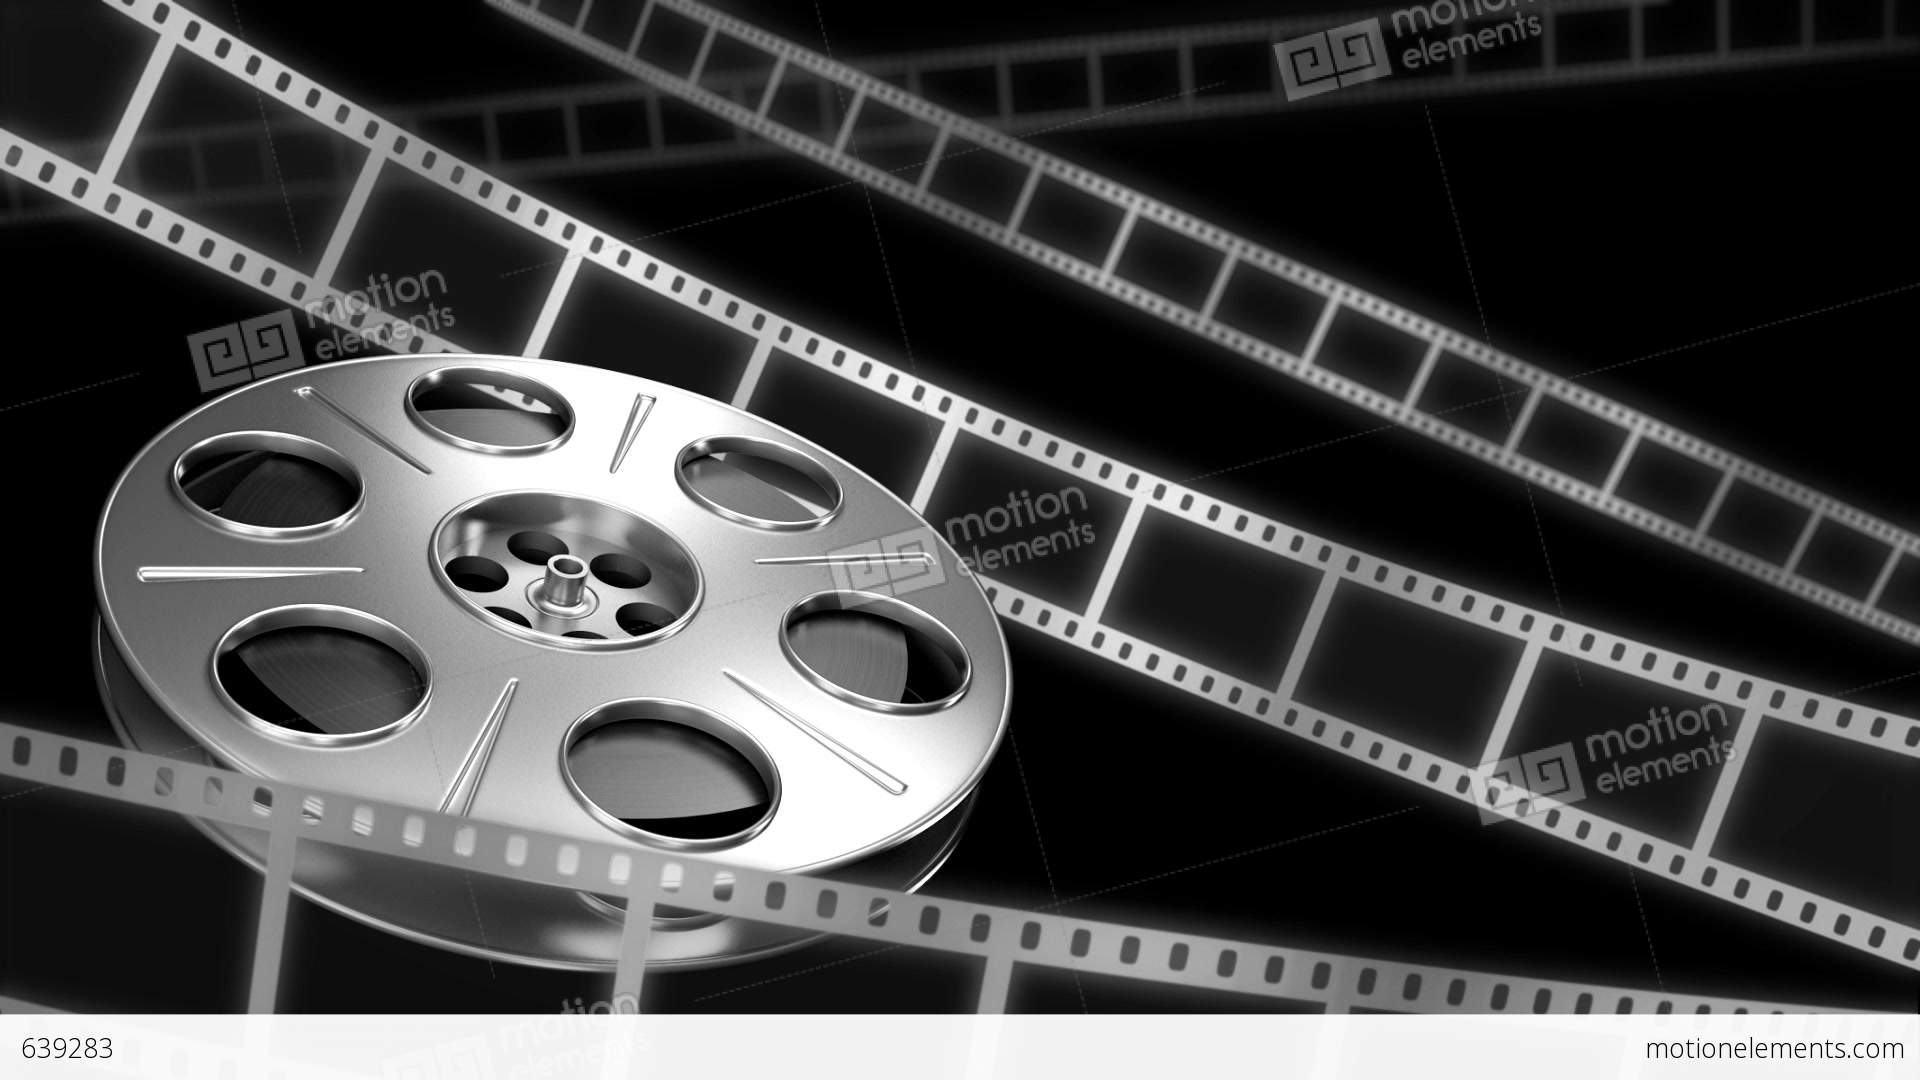 S Animation Wallpaper Cinema Background Stock Animation 639283